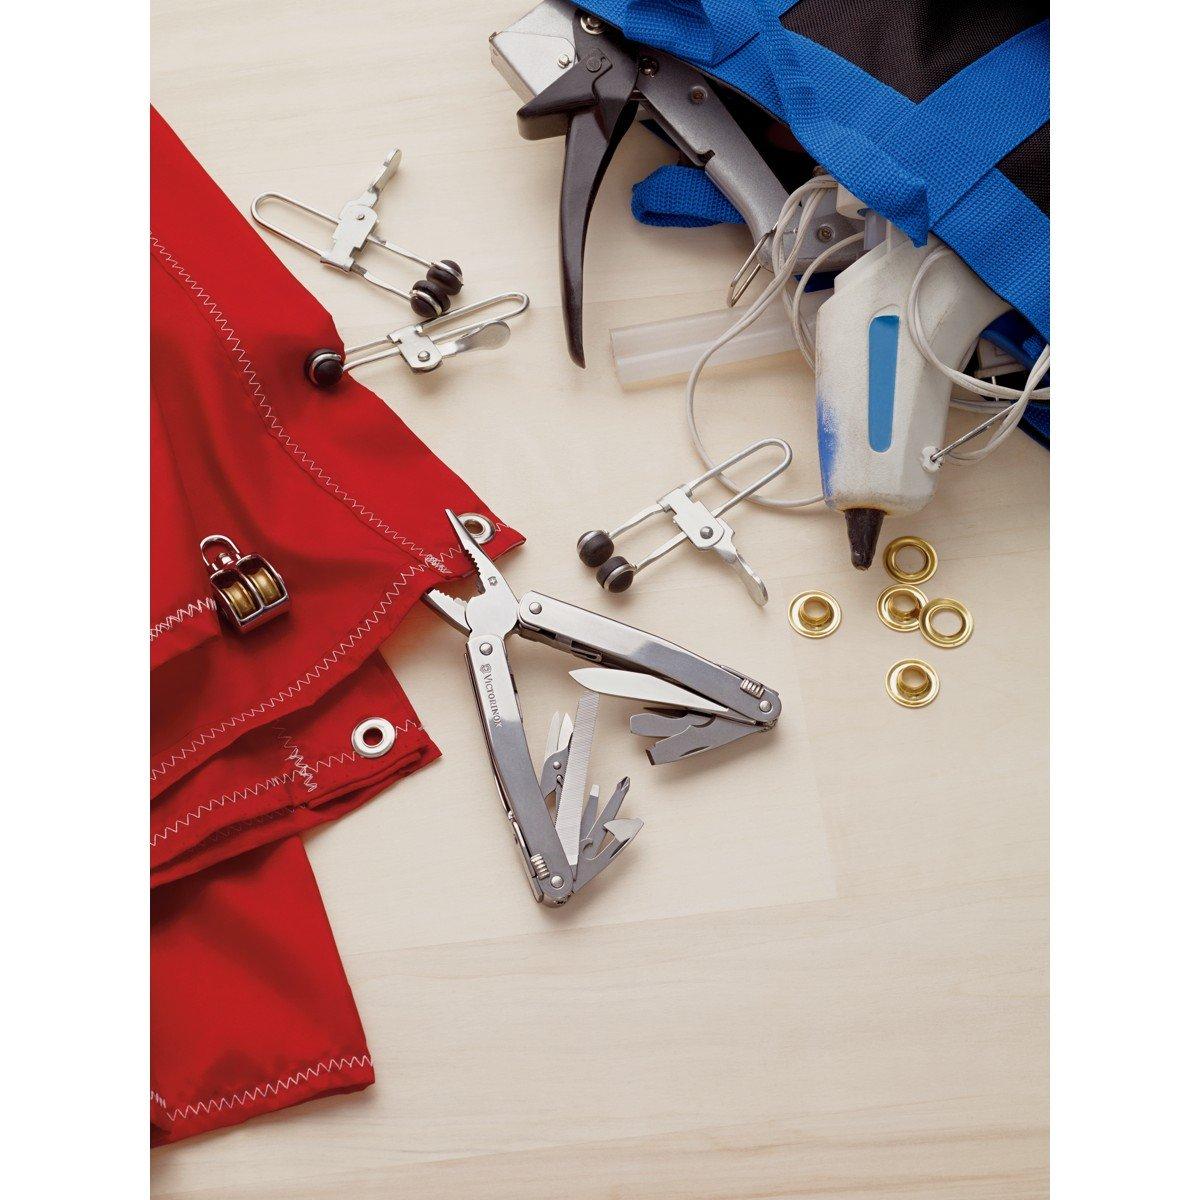 Victorinox Swiss Army SwissTool Spirit Multi-Tool, Includes Nylon Pouch by Victorinox (Image #4)